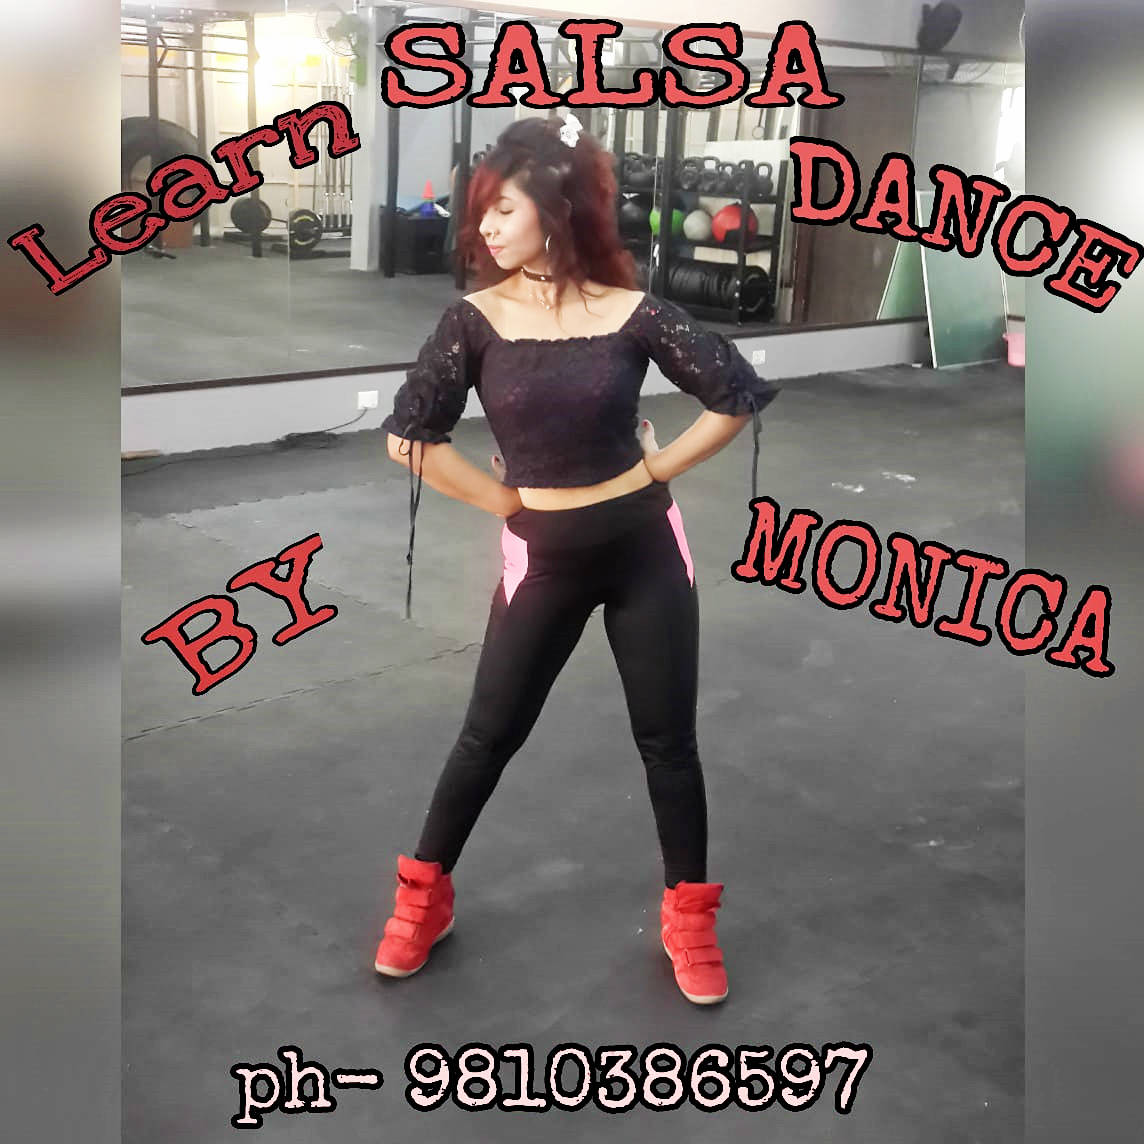 Monica Salsa Bachata Latin Dance School Noida Ghaziabad New Delhi - Dance With Me India